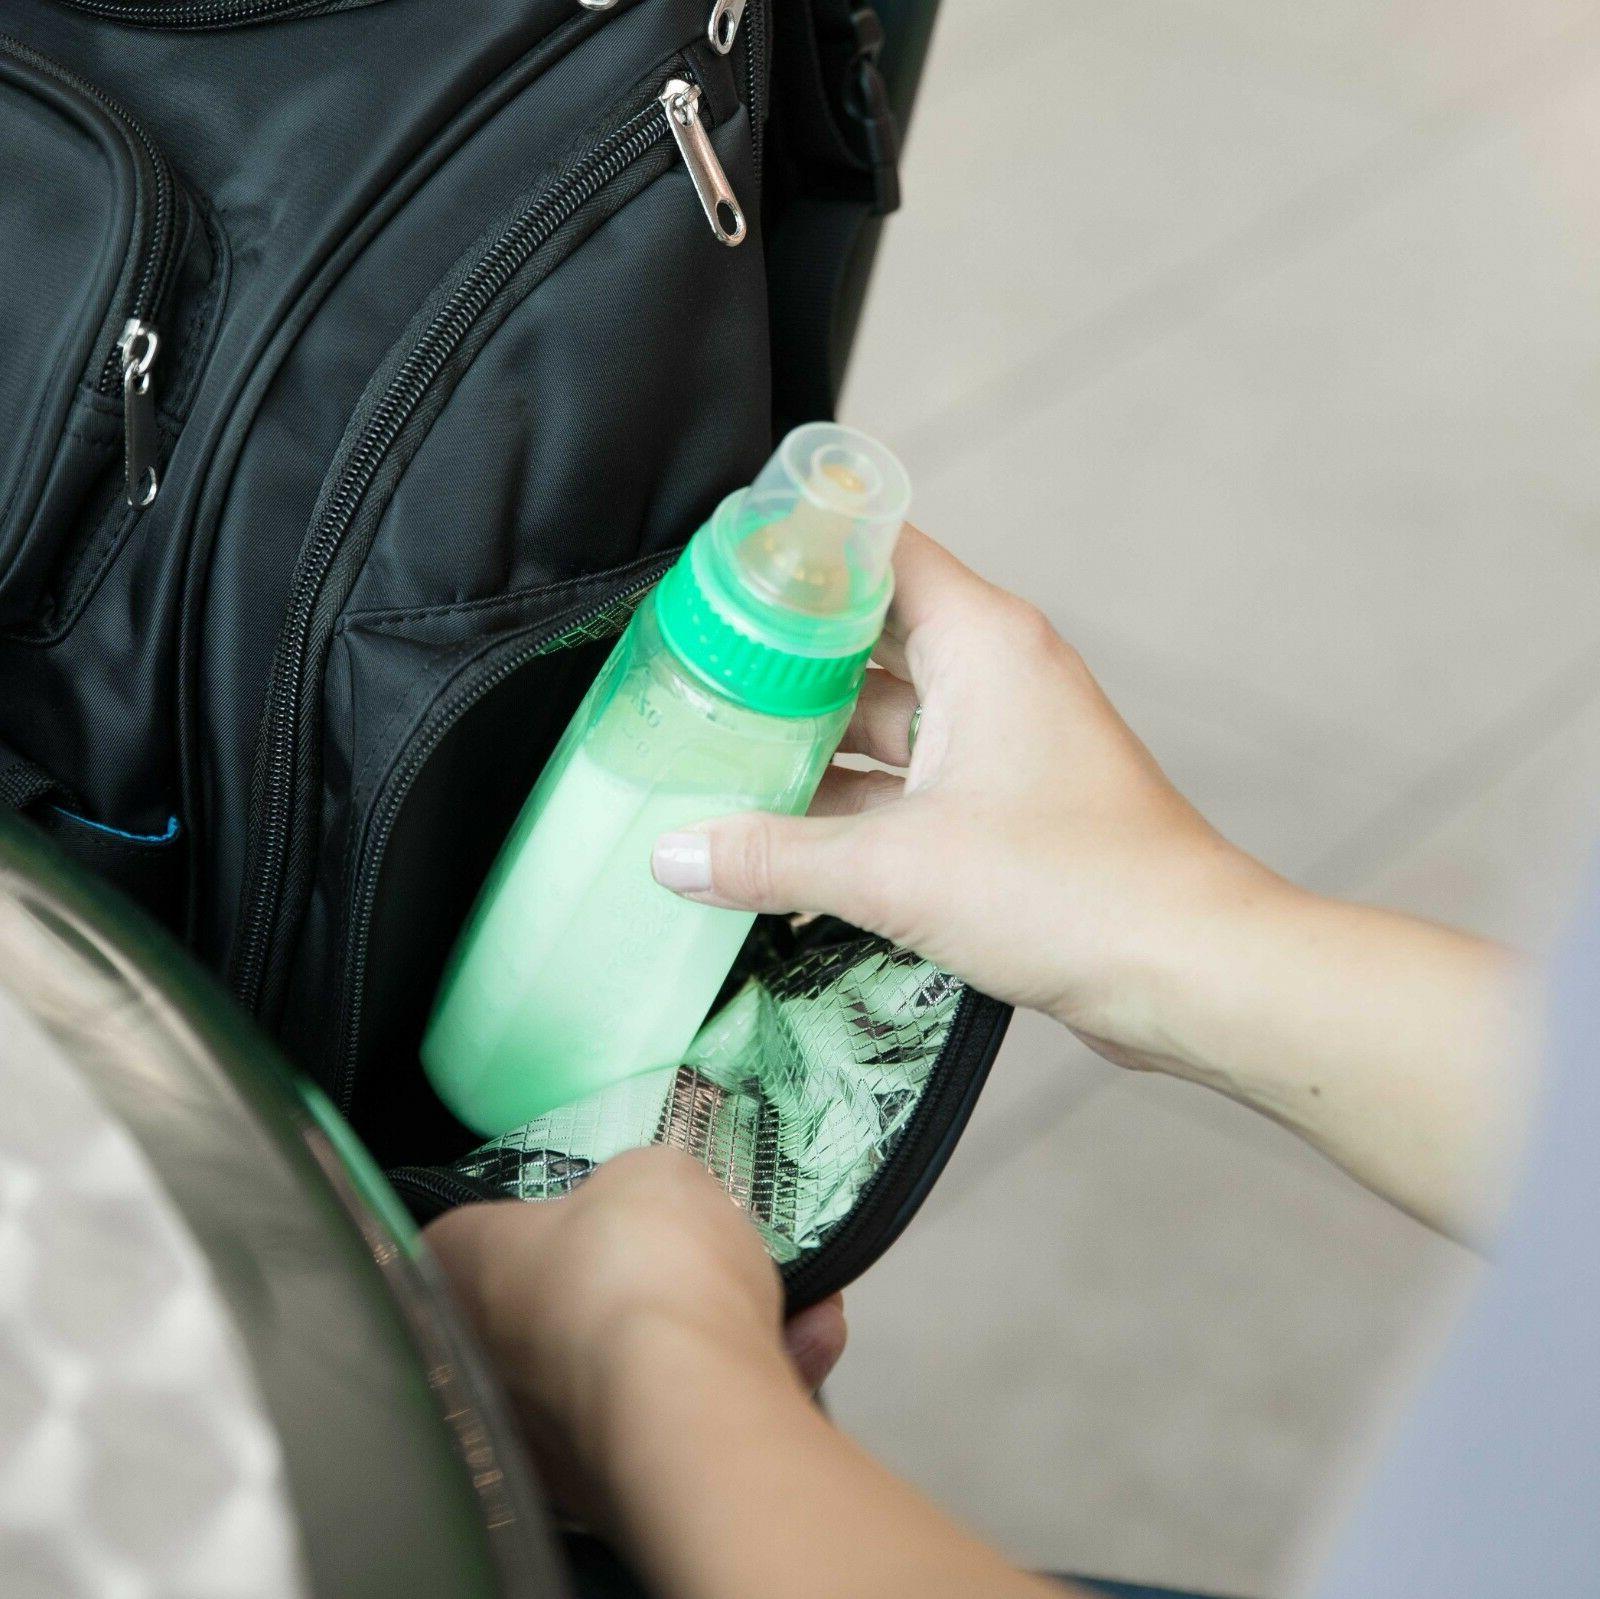 Diaper Bag Backpack Straps, Wipes Dispenser.